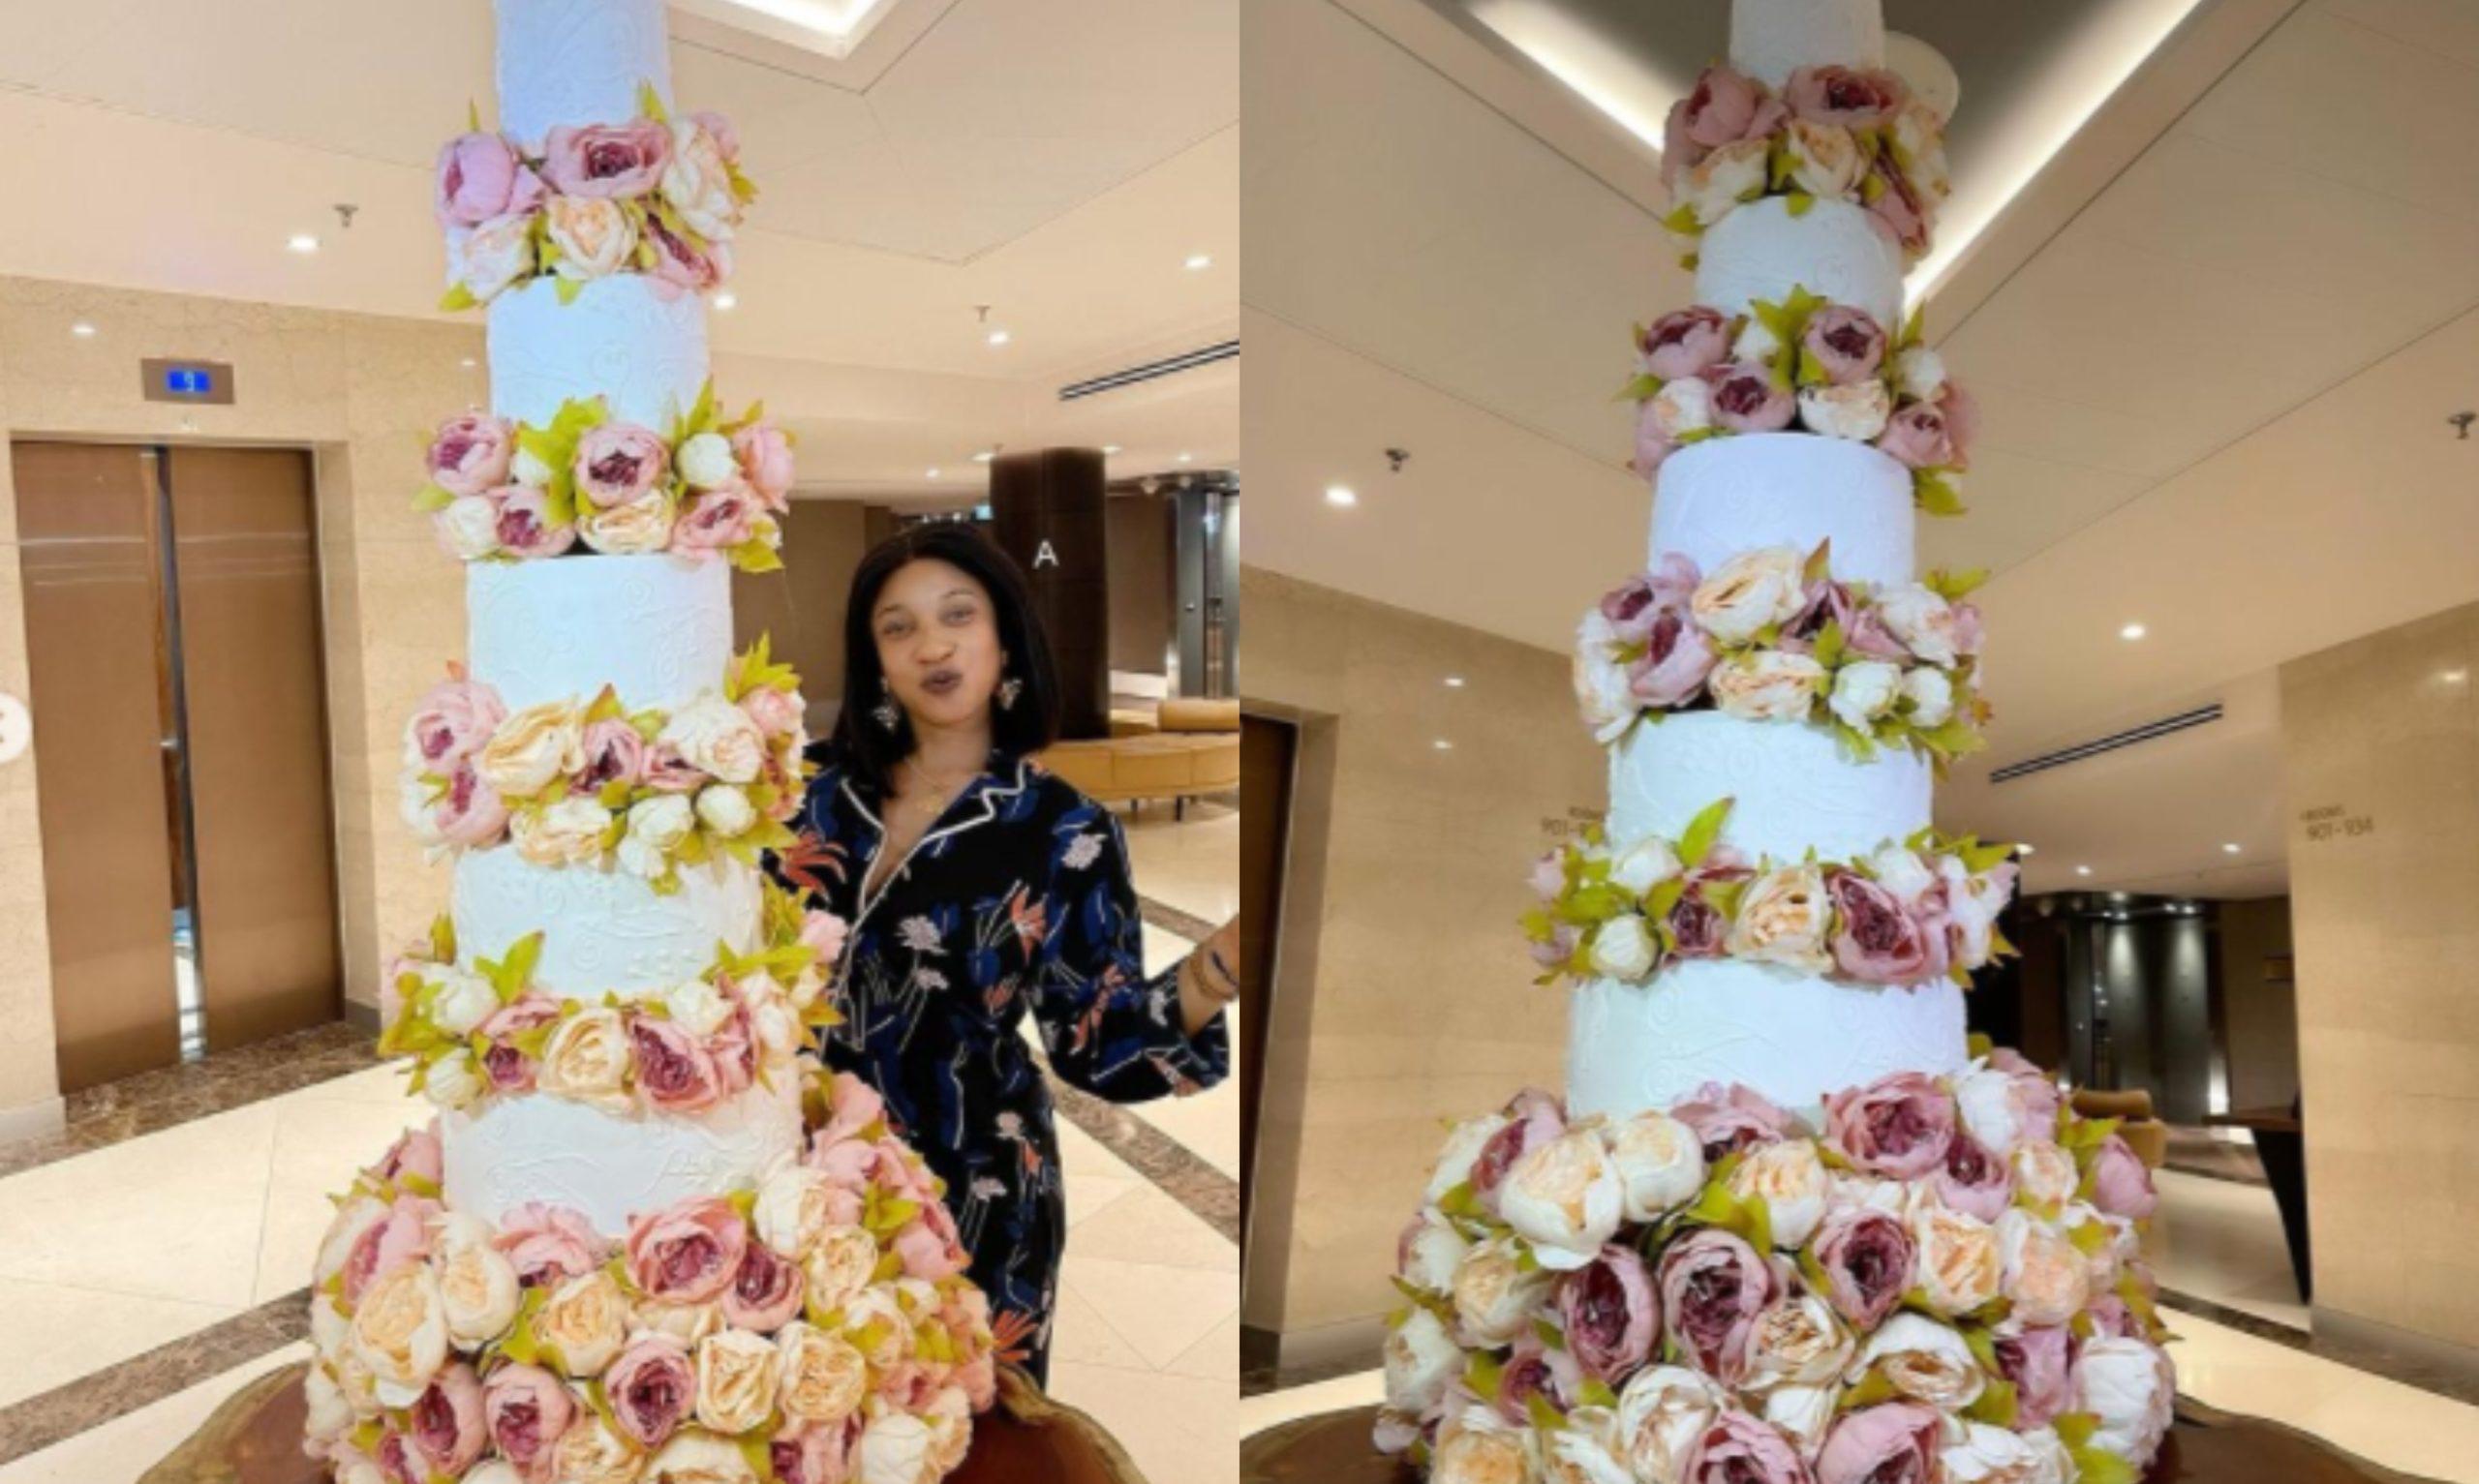 PHOTOS: Tonto Dikeh shows off gigantic birthday cake